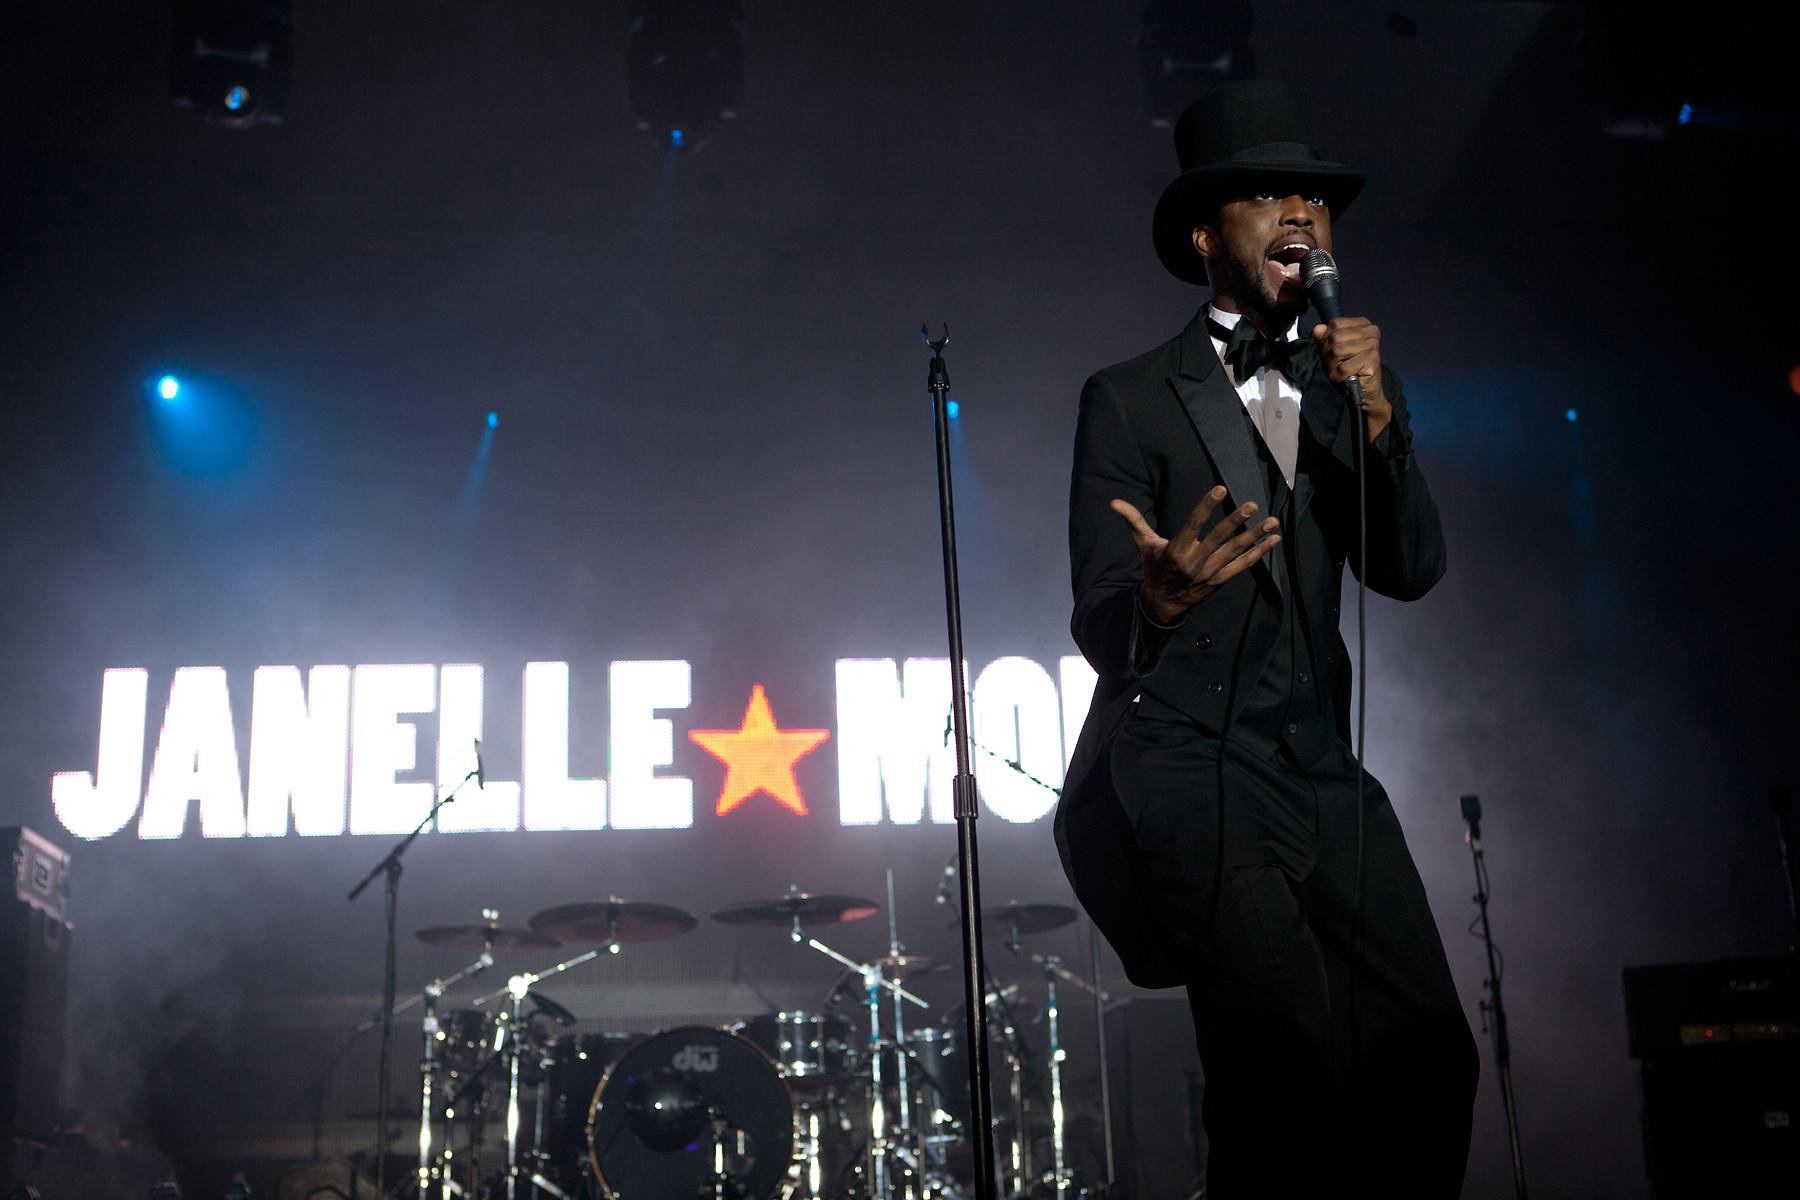 Janelle Monae @ CMF Indie Awards 2011